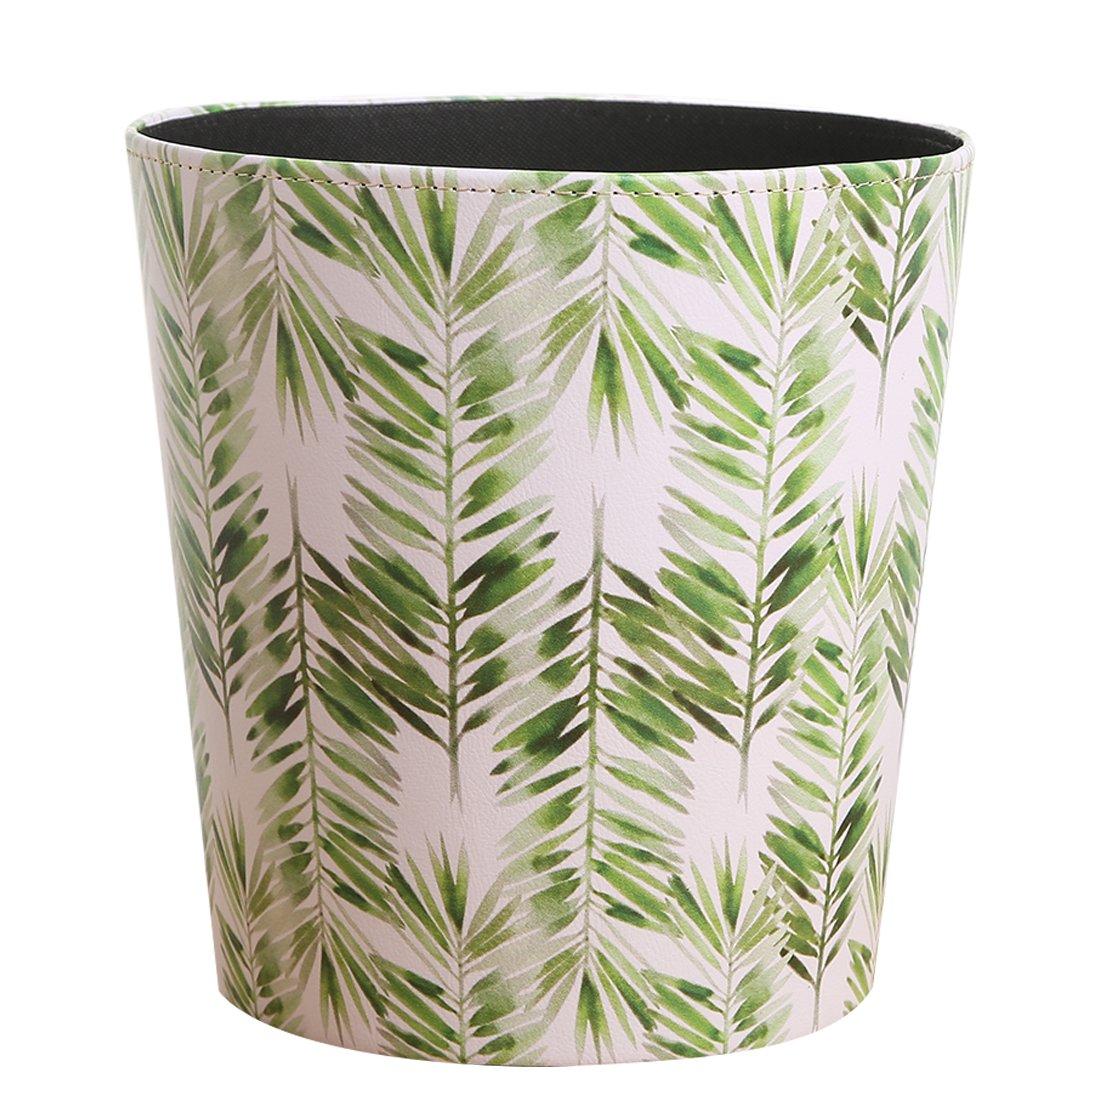 LoKauf 10L Vintage Waste Paper Bin Waste Paper Basket Trash Bin Household Wastebasket 26 * 26 * 26cm